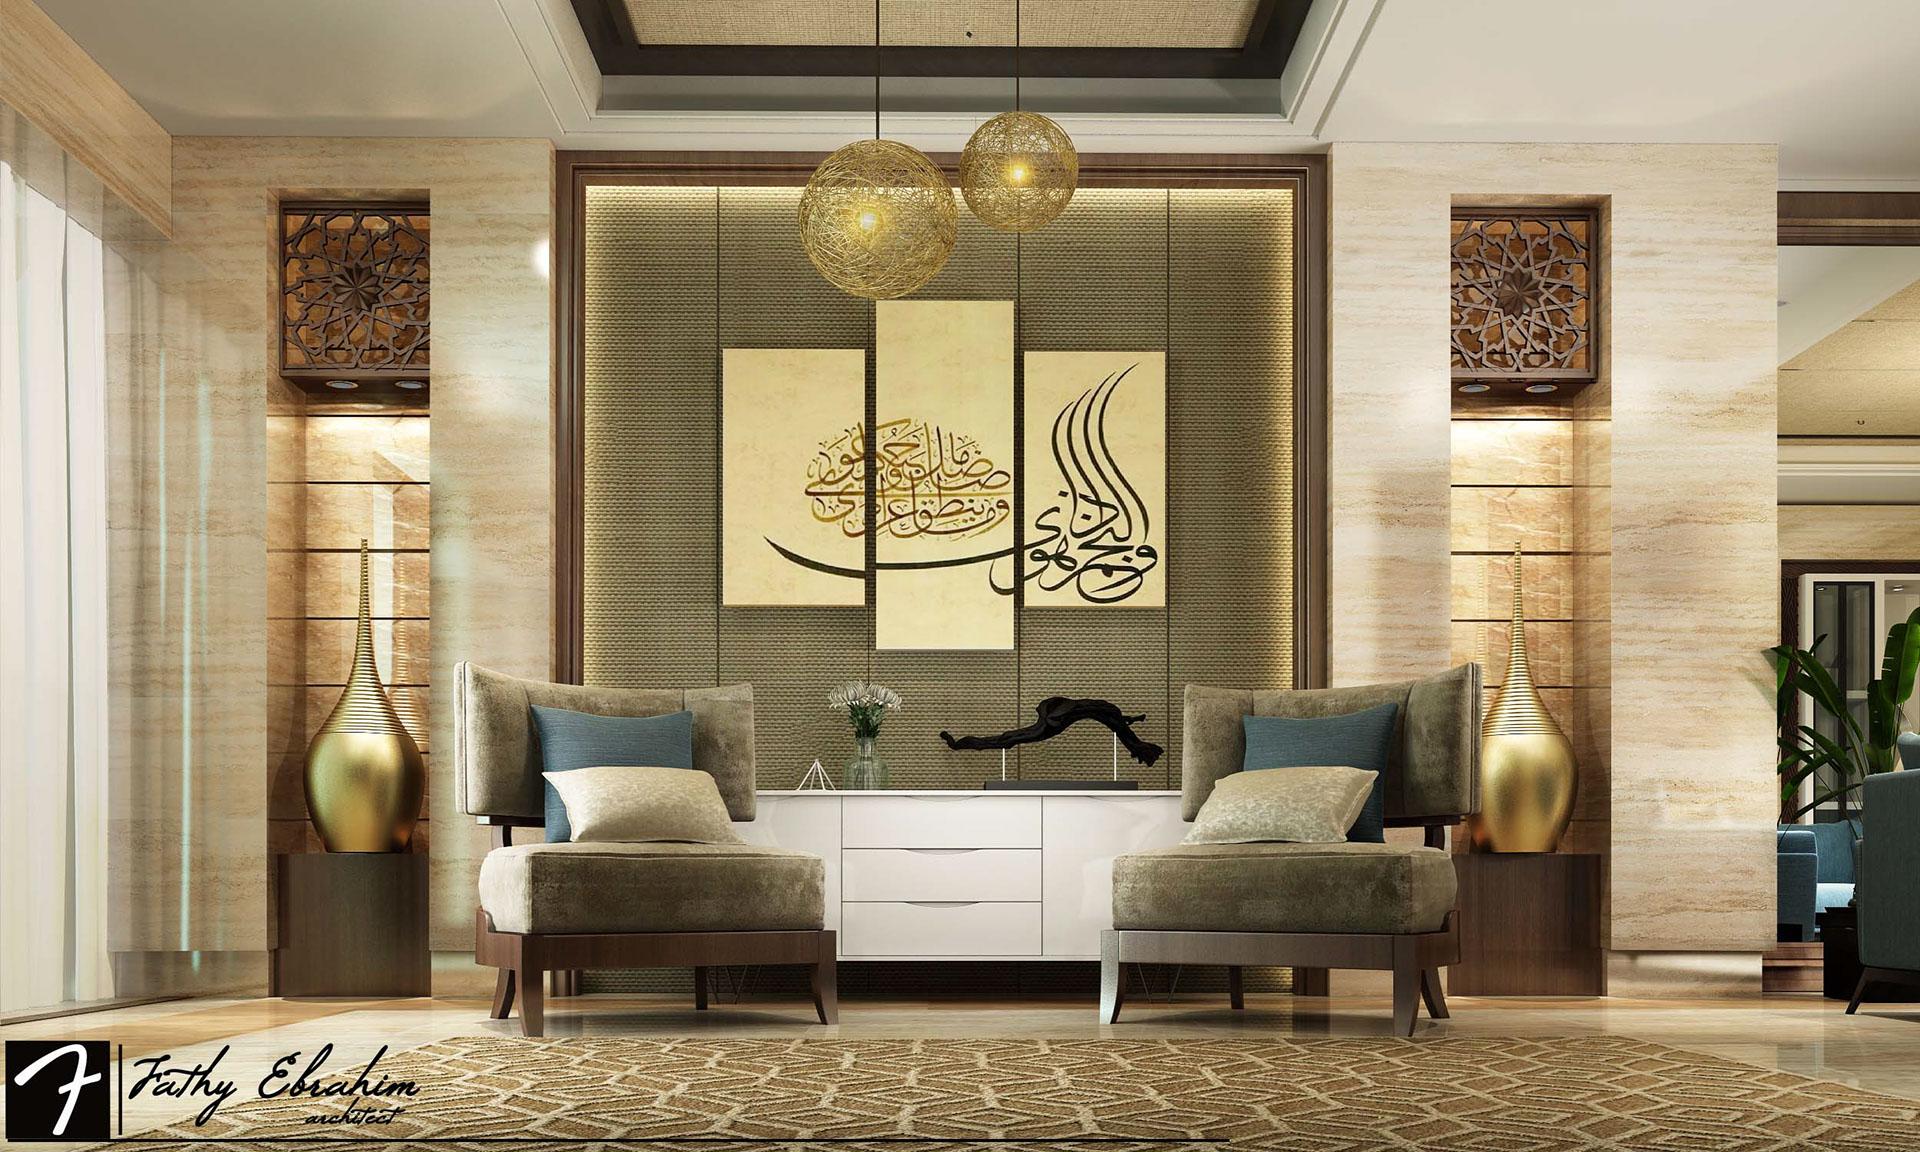 Modern Islamic Interior Design On Behance